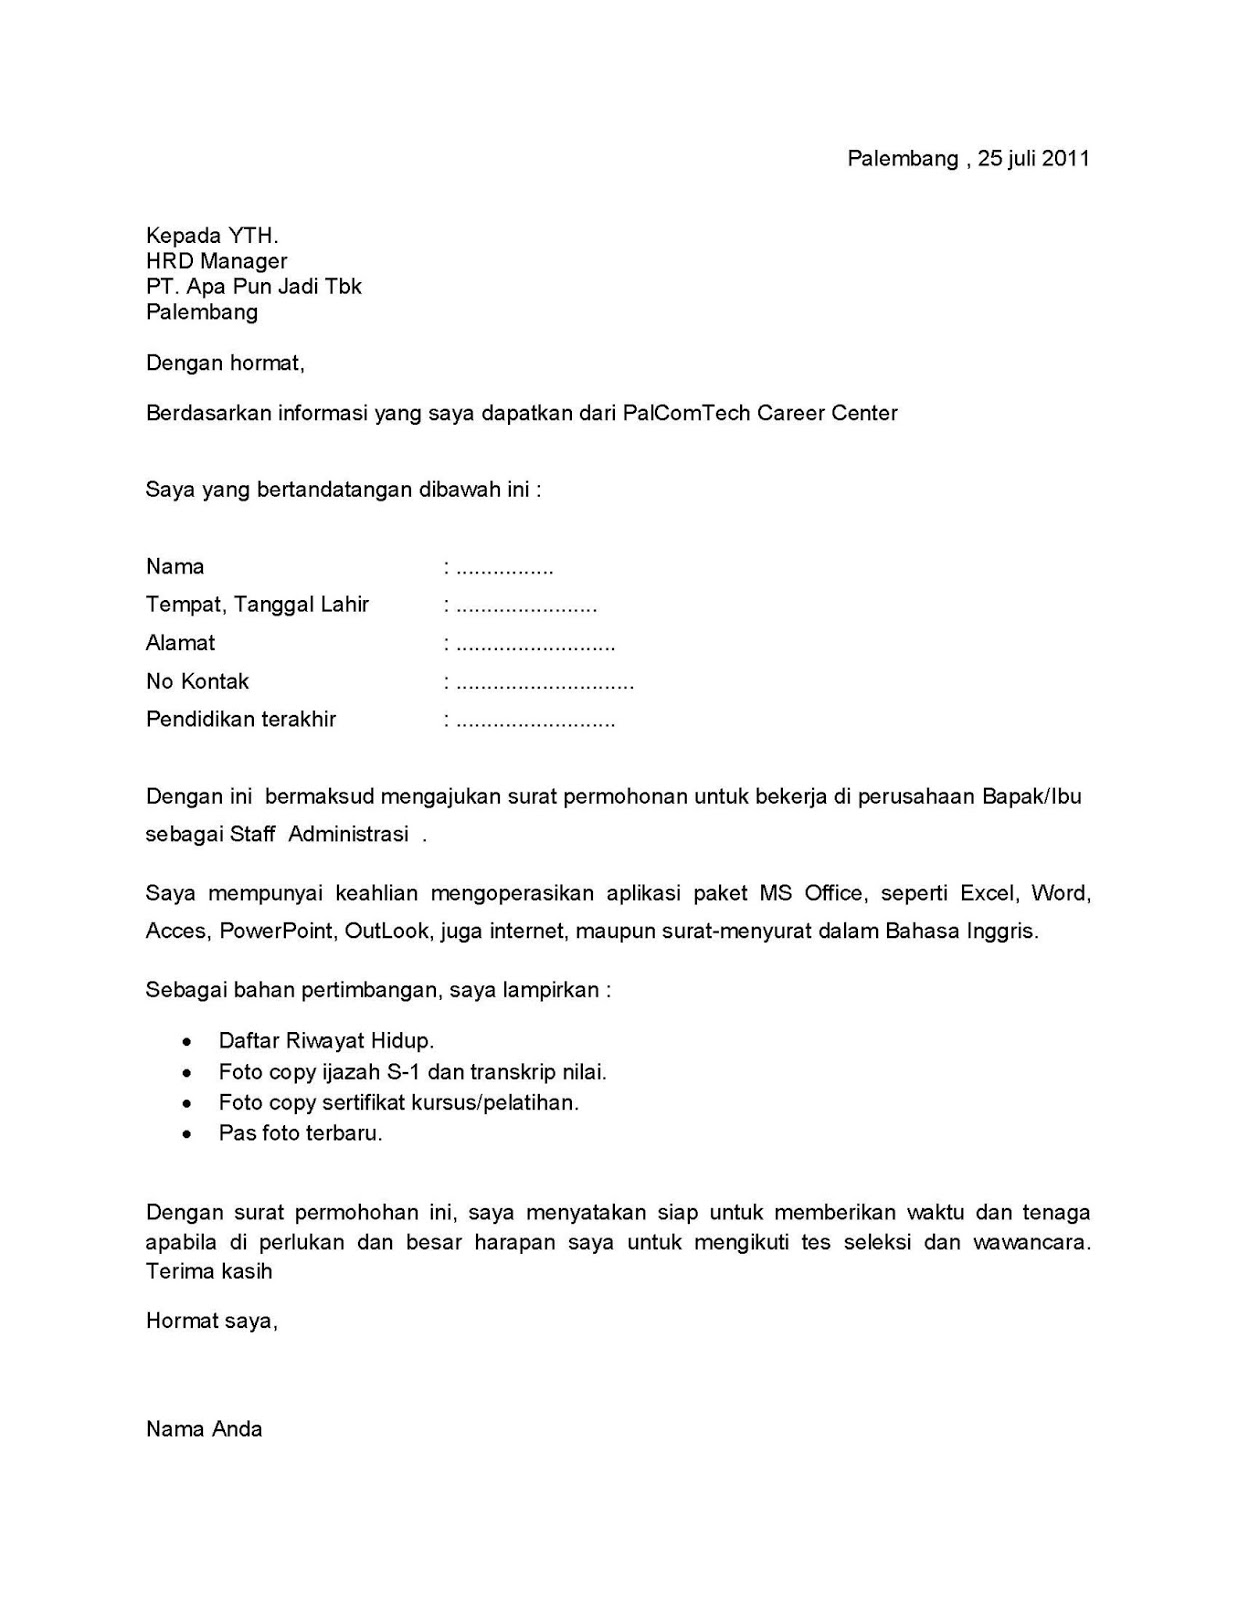 Iklan Tentang Lamaran Pekerjaan Di Kudus Tahun 2013 Agen Asuransi Contoh Surat Lamaran Kerja Yang Benar Kata Kata Gokil Raja Gombal